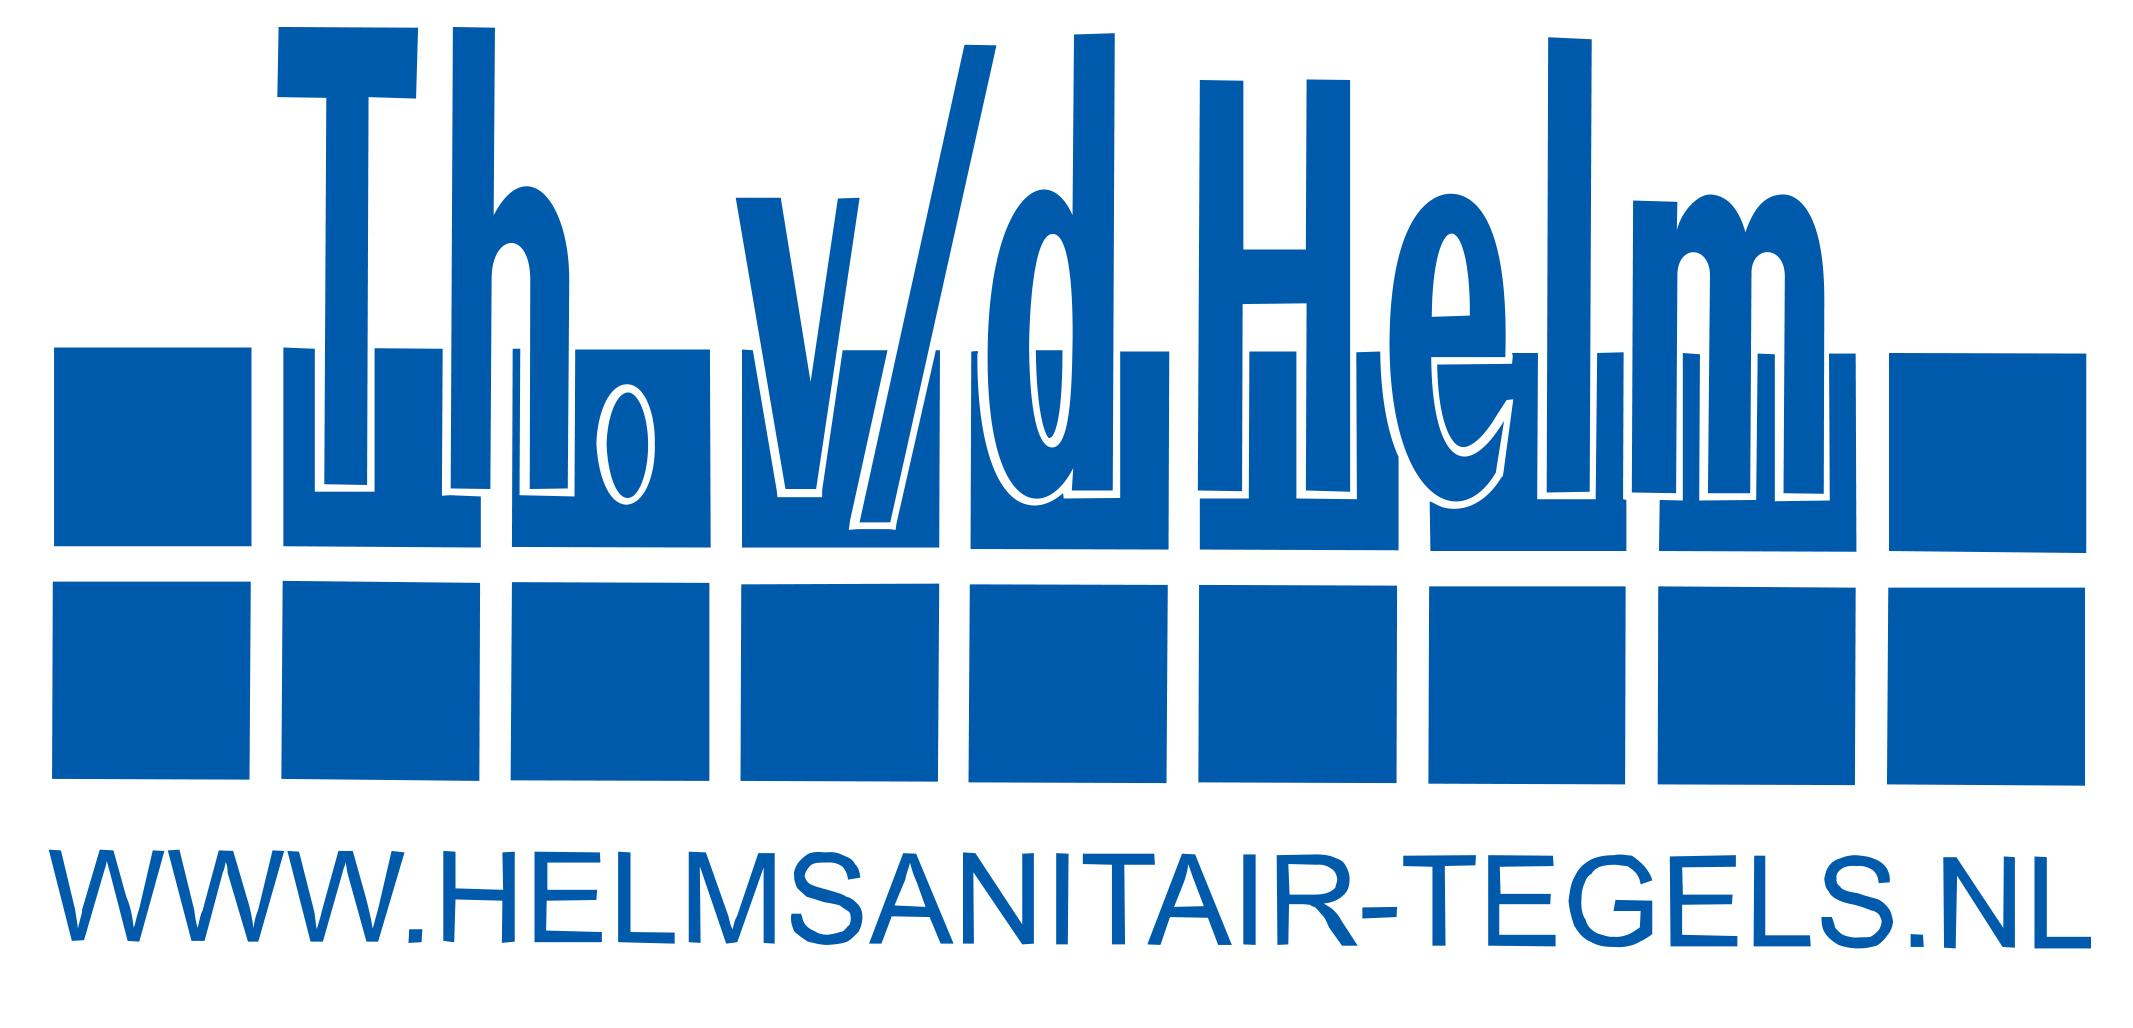 Theo v.d. Helm